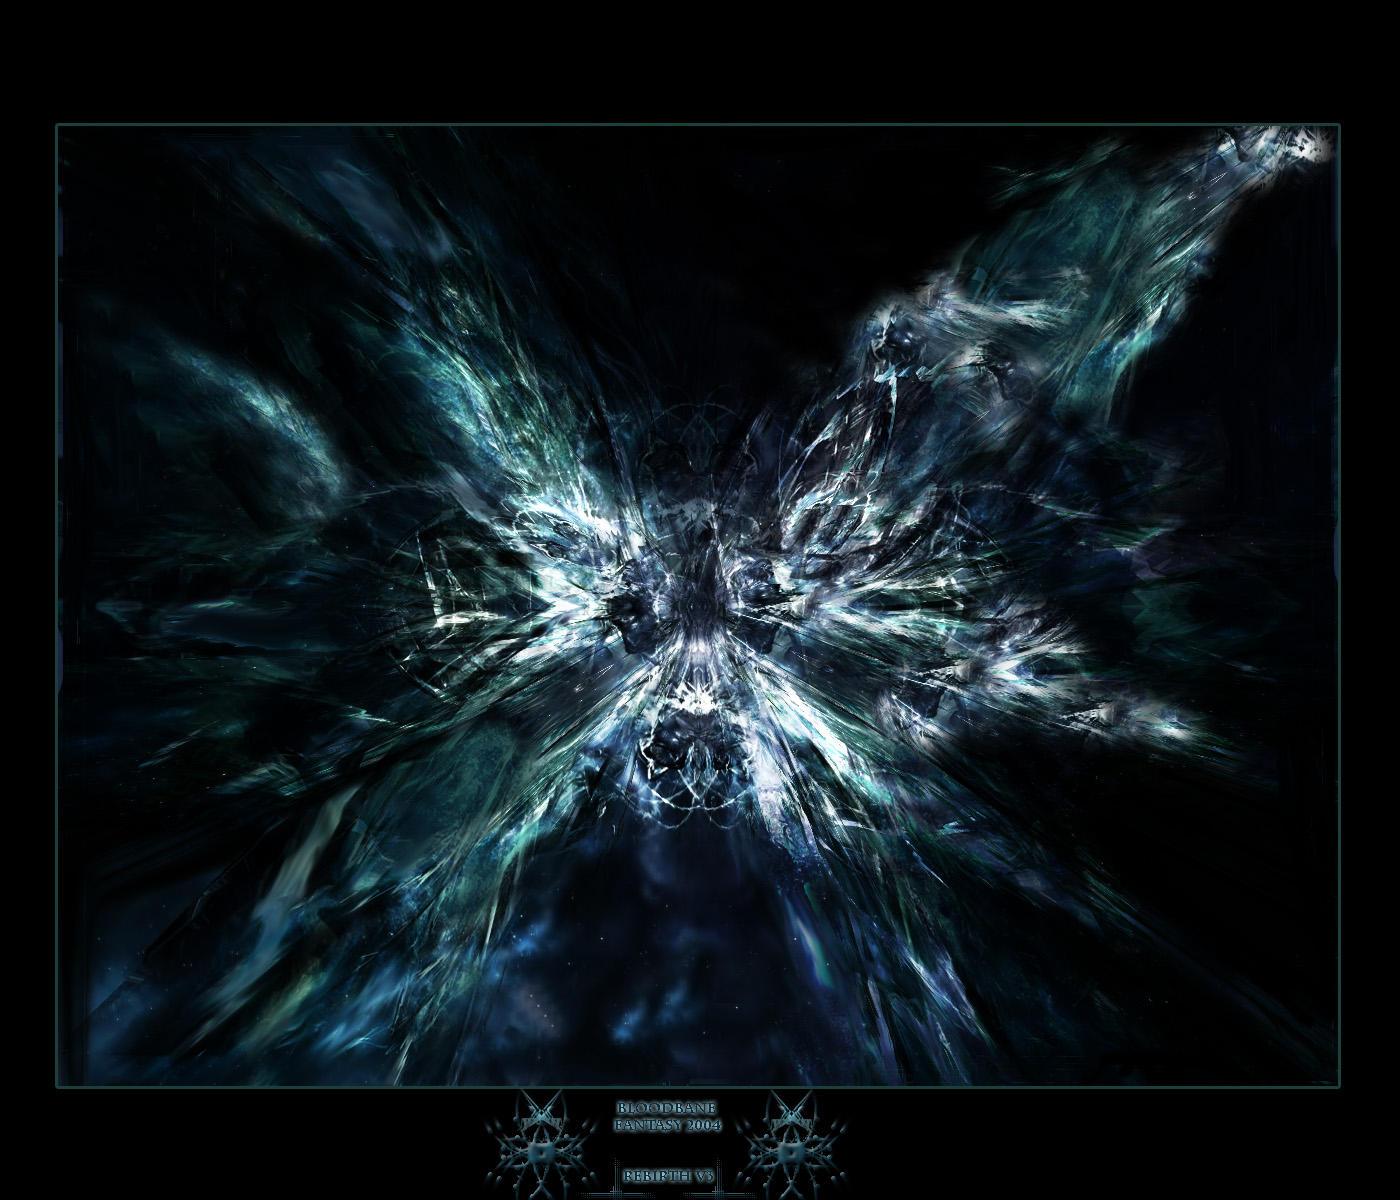 Rebirth by Bloodbane